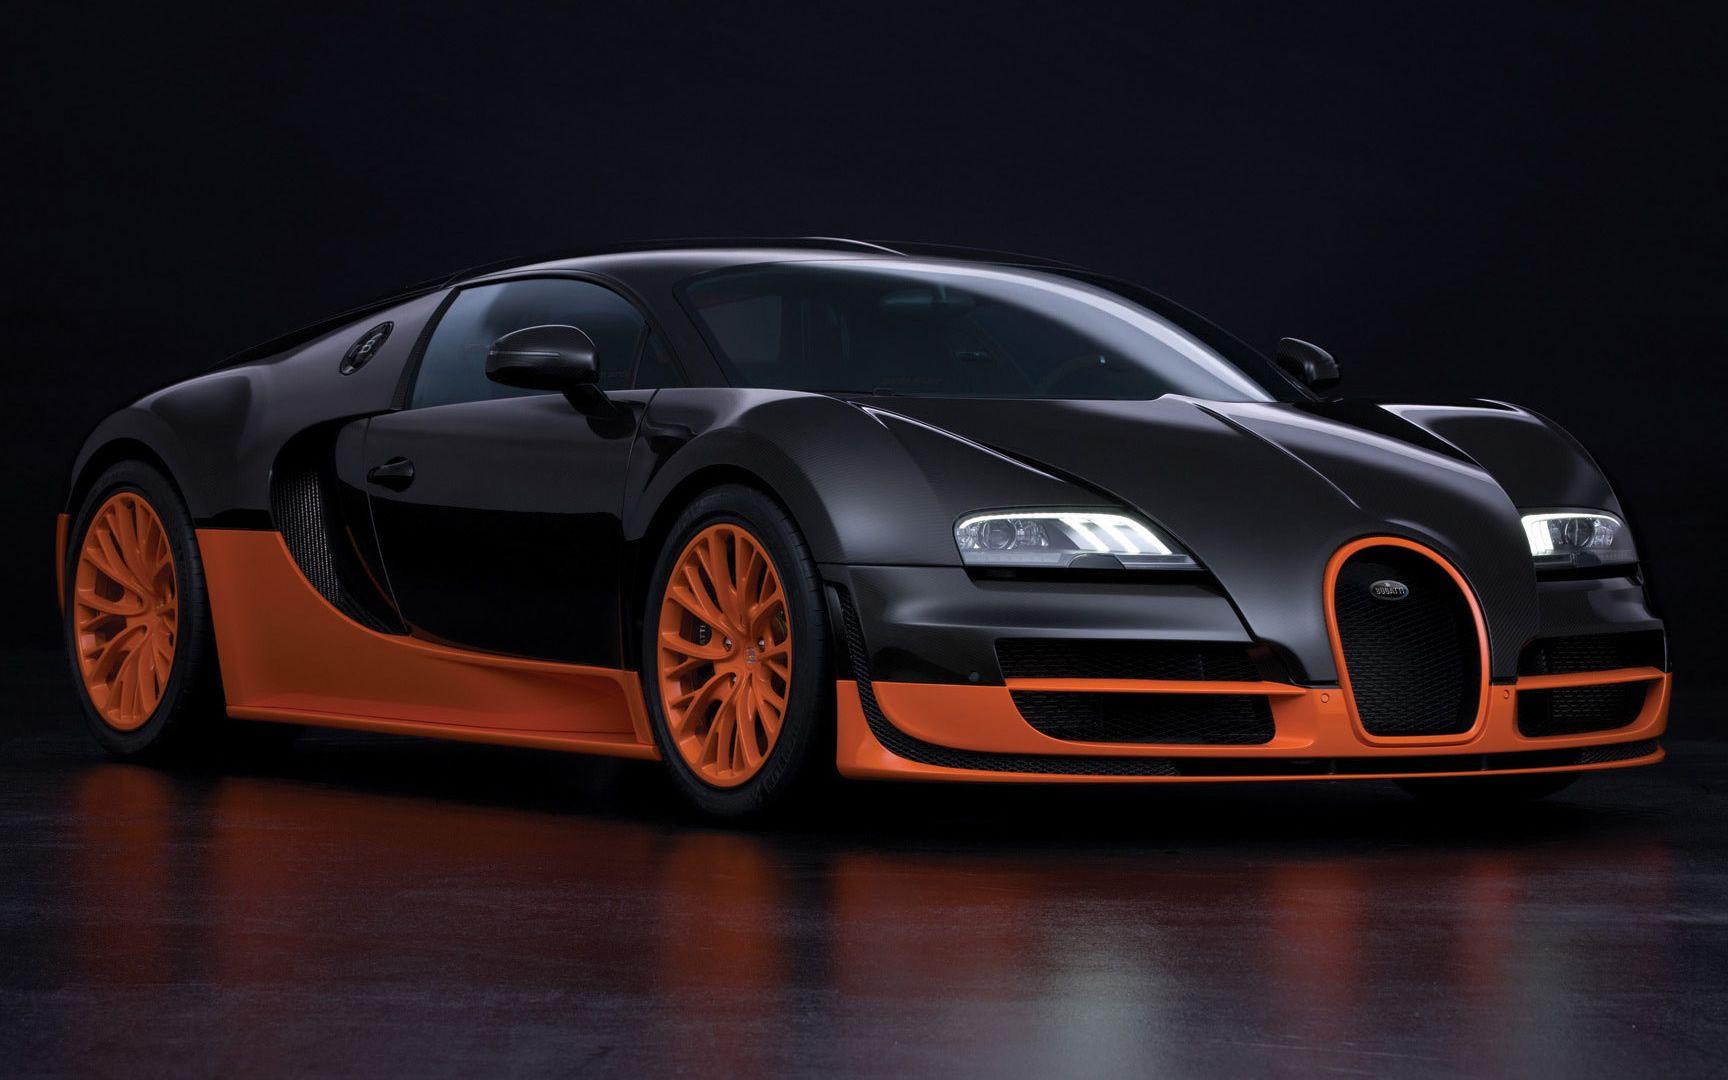 Bugatti To Debut The World S Fastest Supercar At 2013 Frankfurt Motor Show Bugatti Veyron Super Sport Super Sport Cars Bugatti Veyron 16